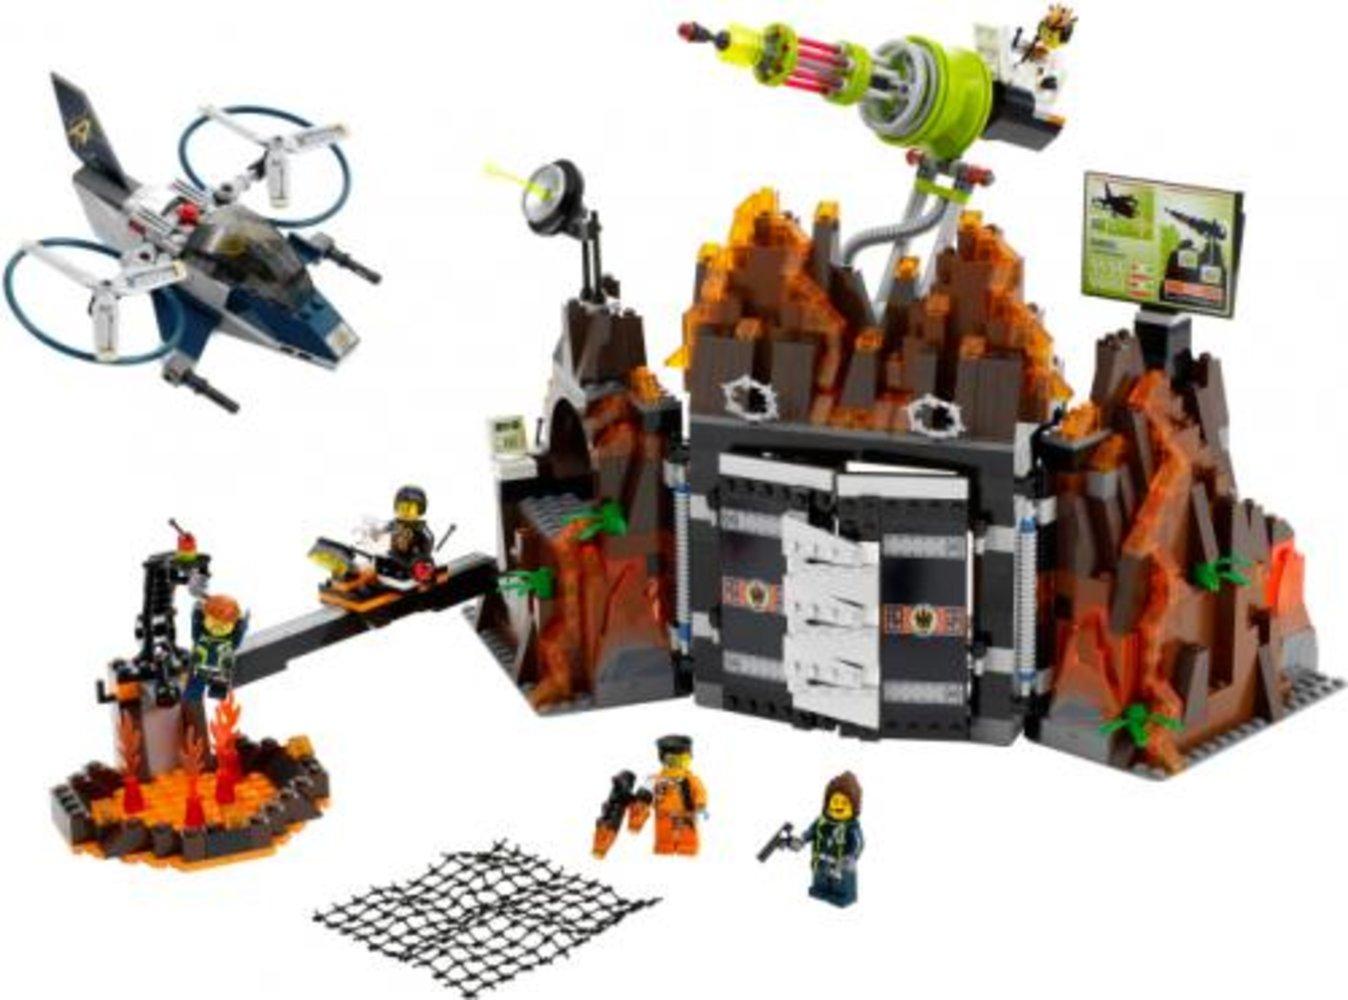 Mission 8: Volcano Base